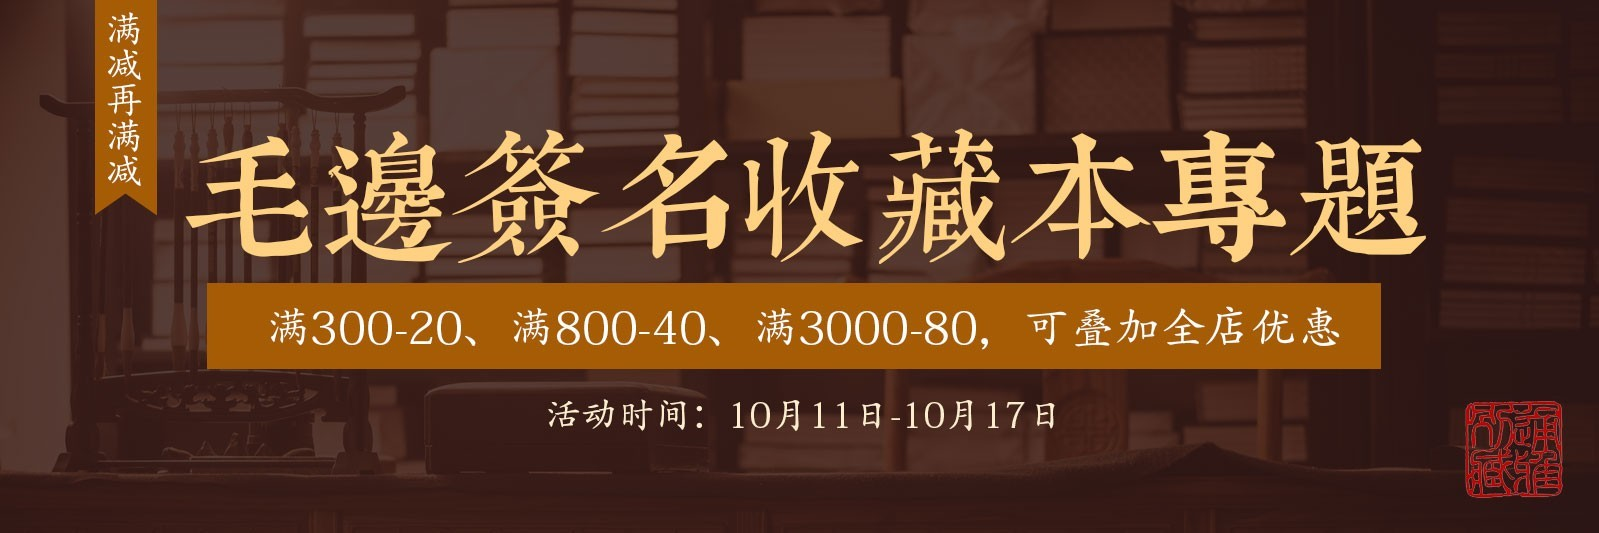 https://shop.zge21.com/3669/special/73458/